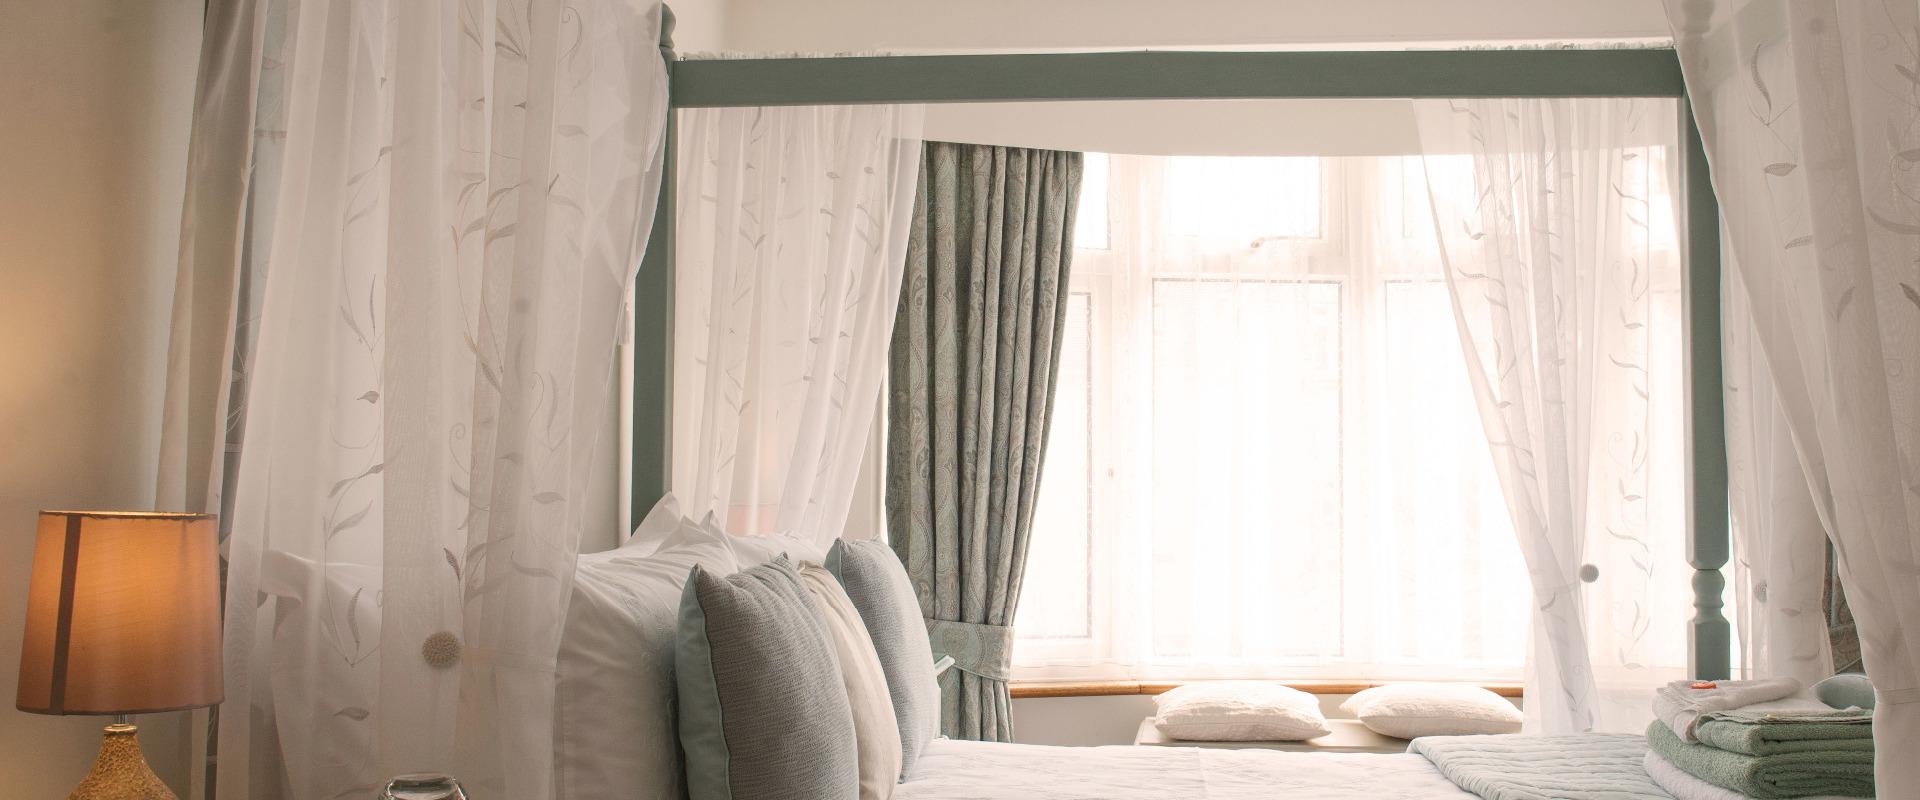 Bed room in Paignton